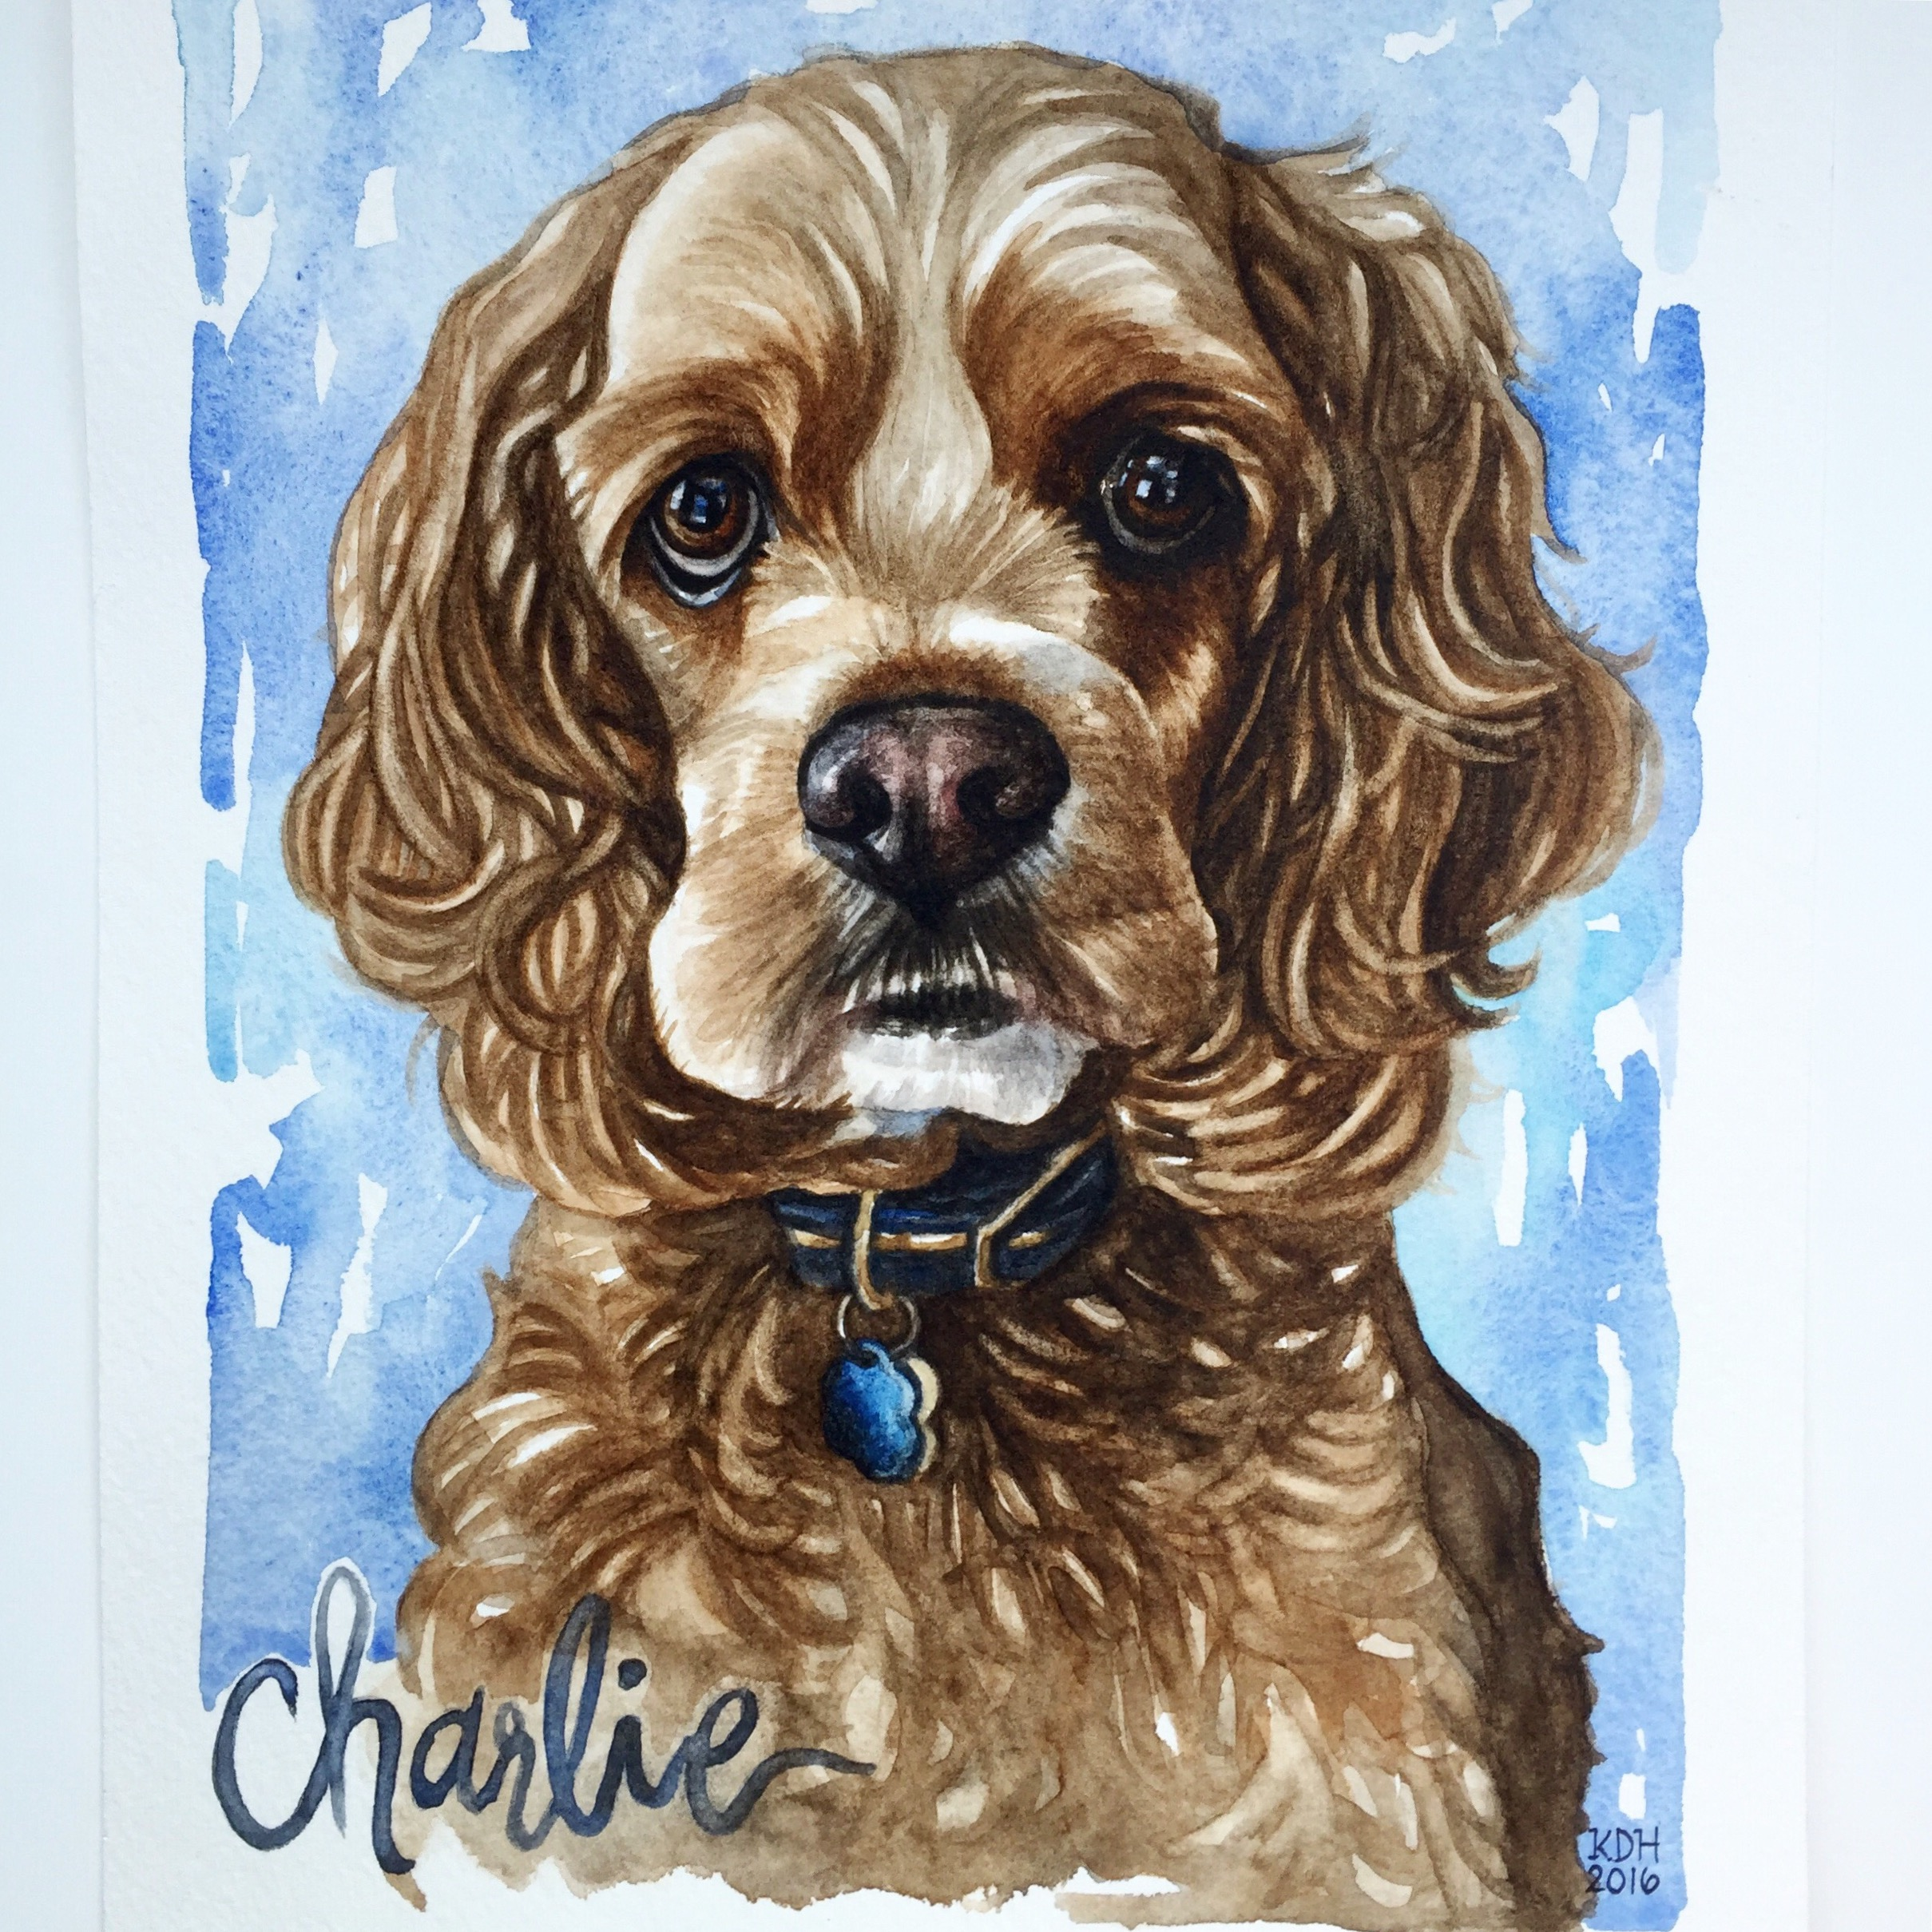 Charlie [9x12]